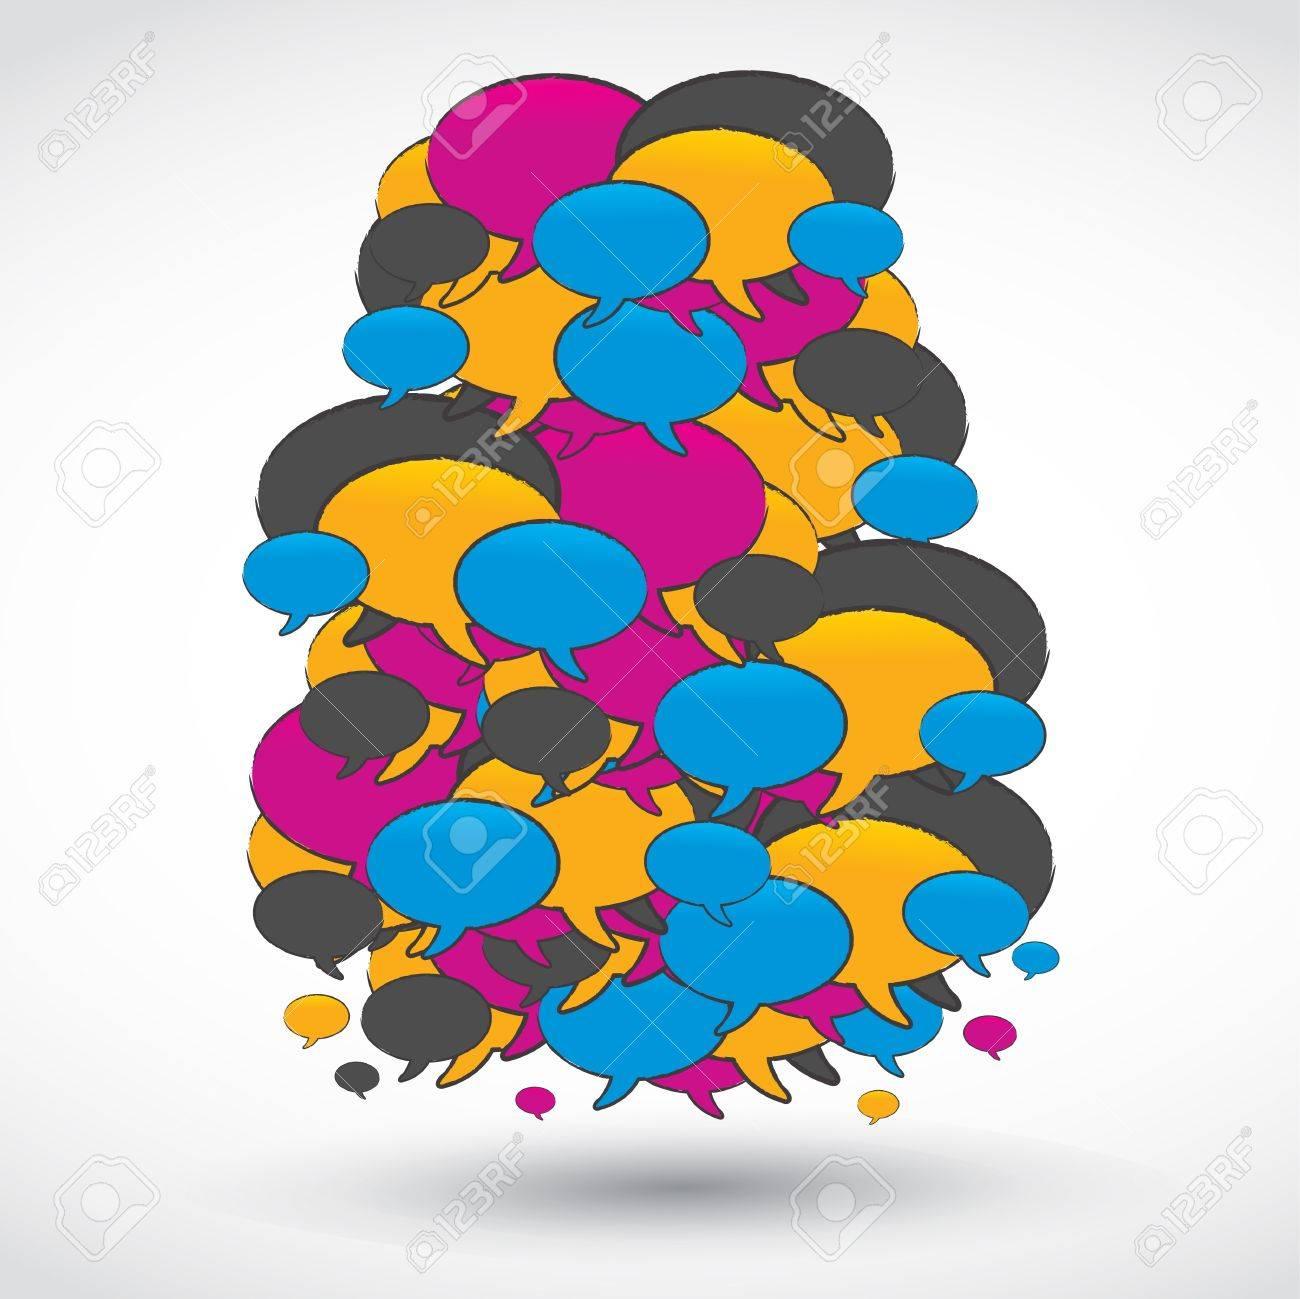 Big social media speech bubble Stock Vector - 15629131